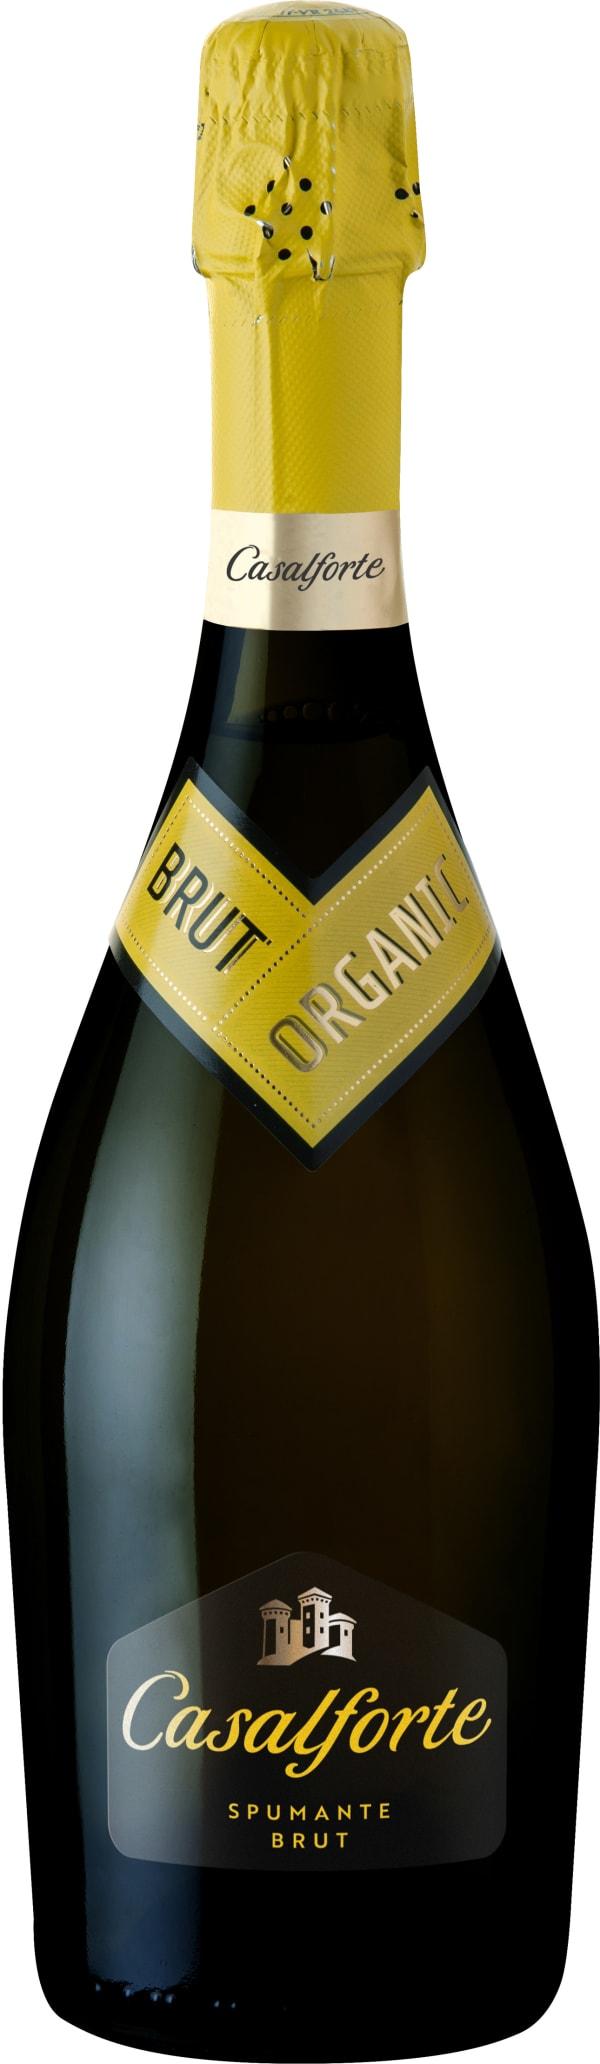 Castelforte Spumante Organic Brut